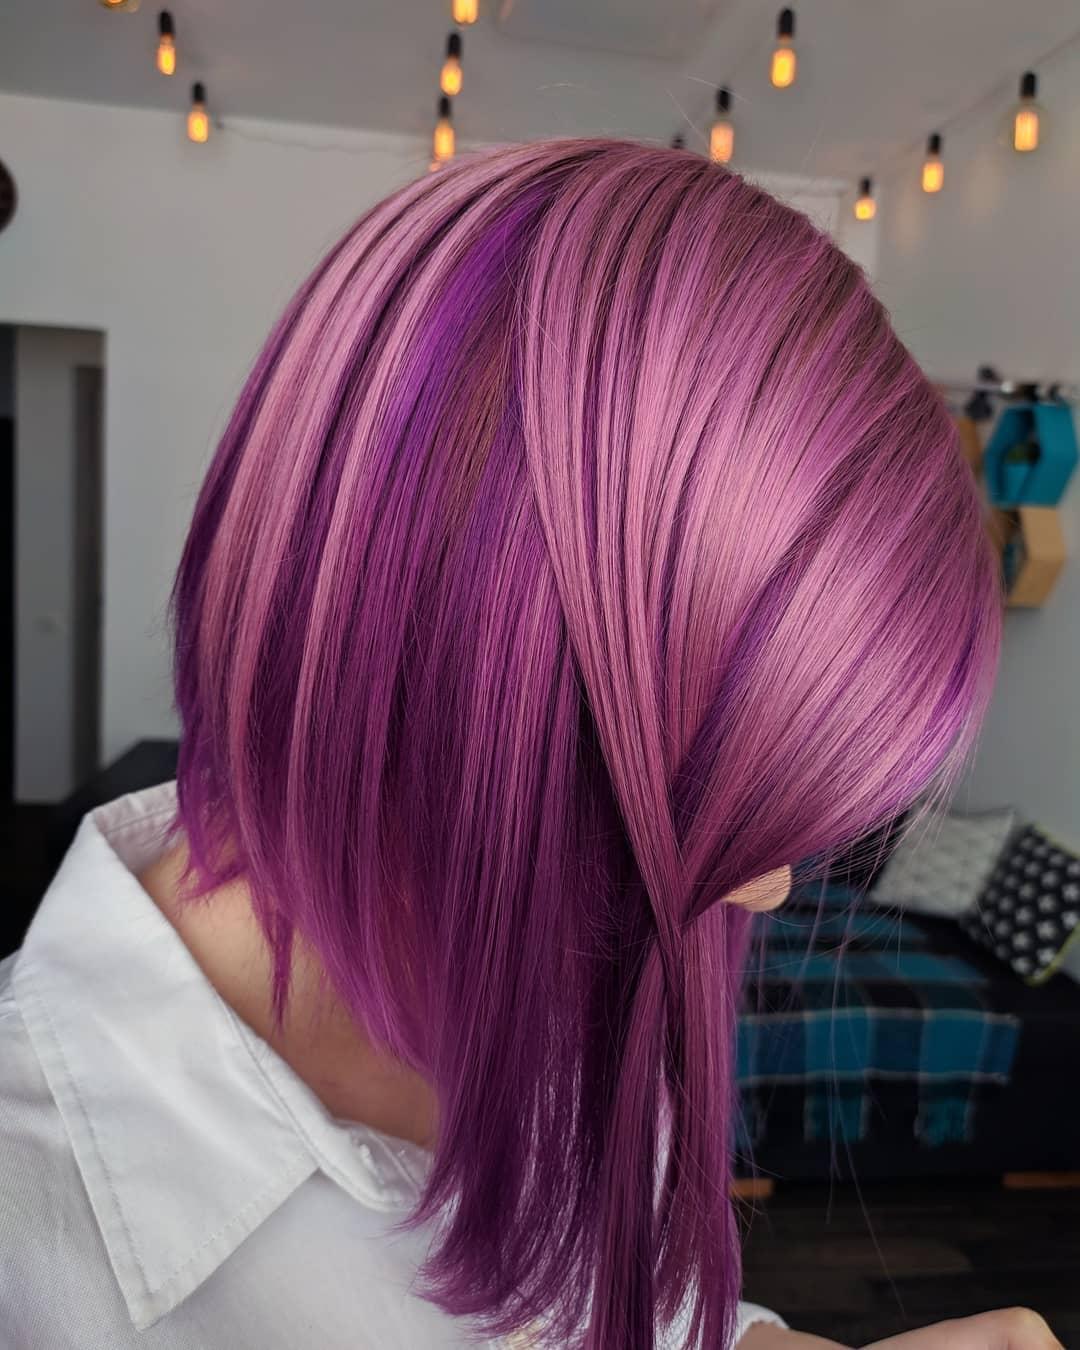 viola lisci